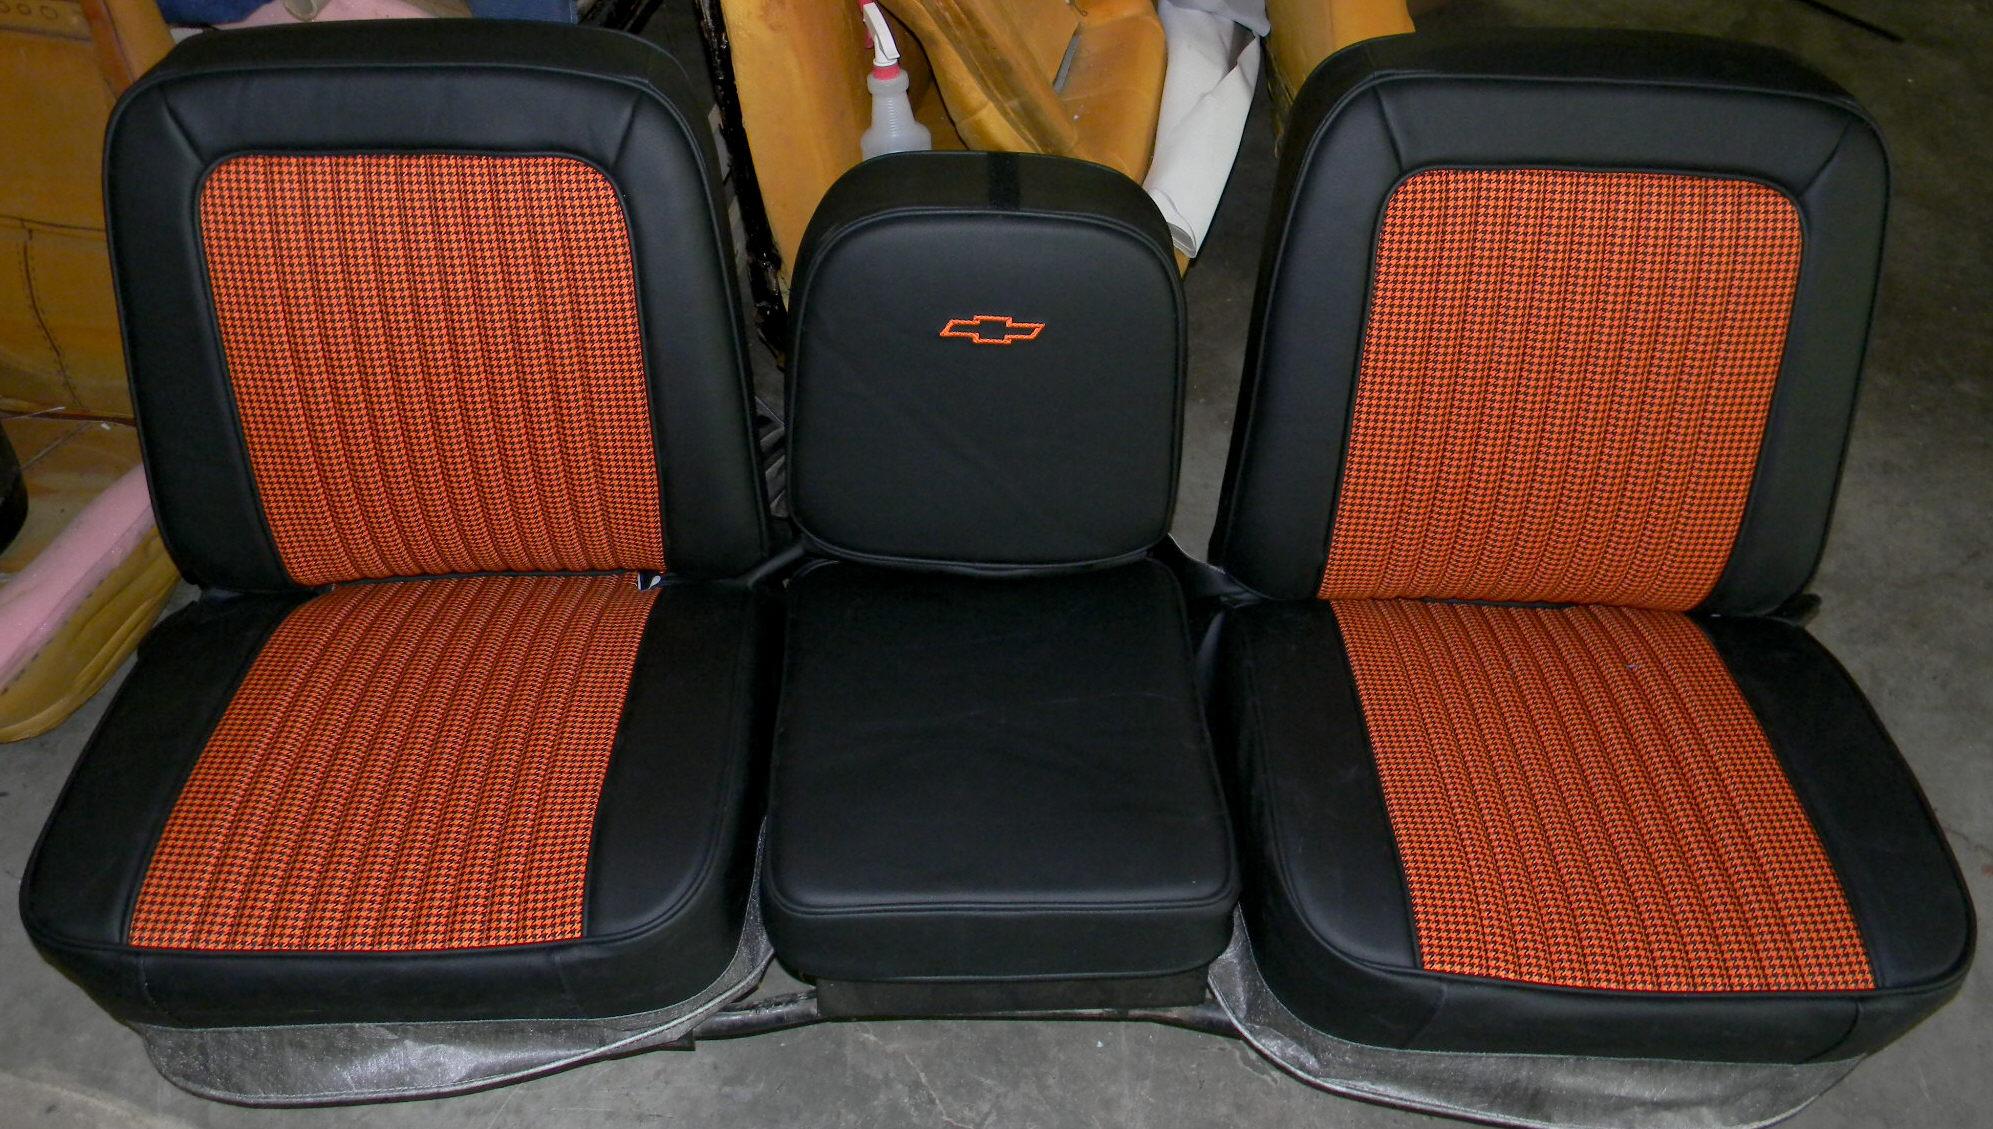 Seat Skins For Trucks >> Rick's Custom Upholstery Completed Truck